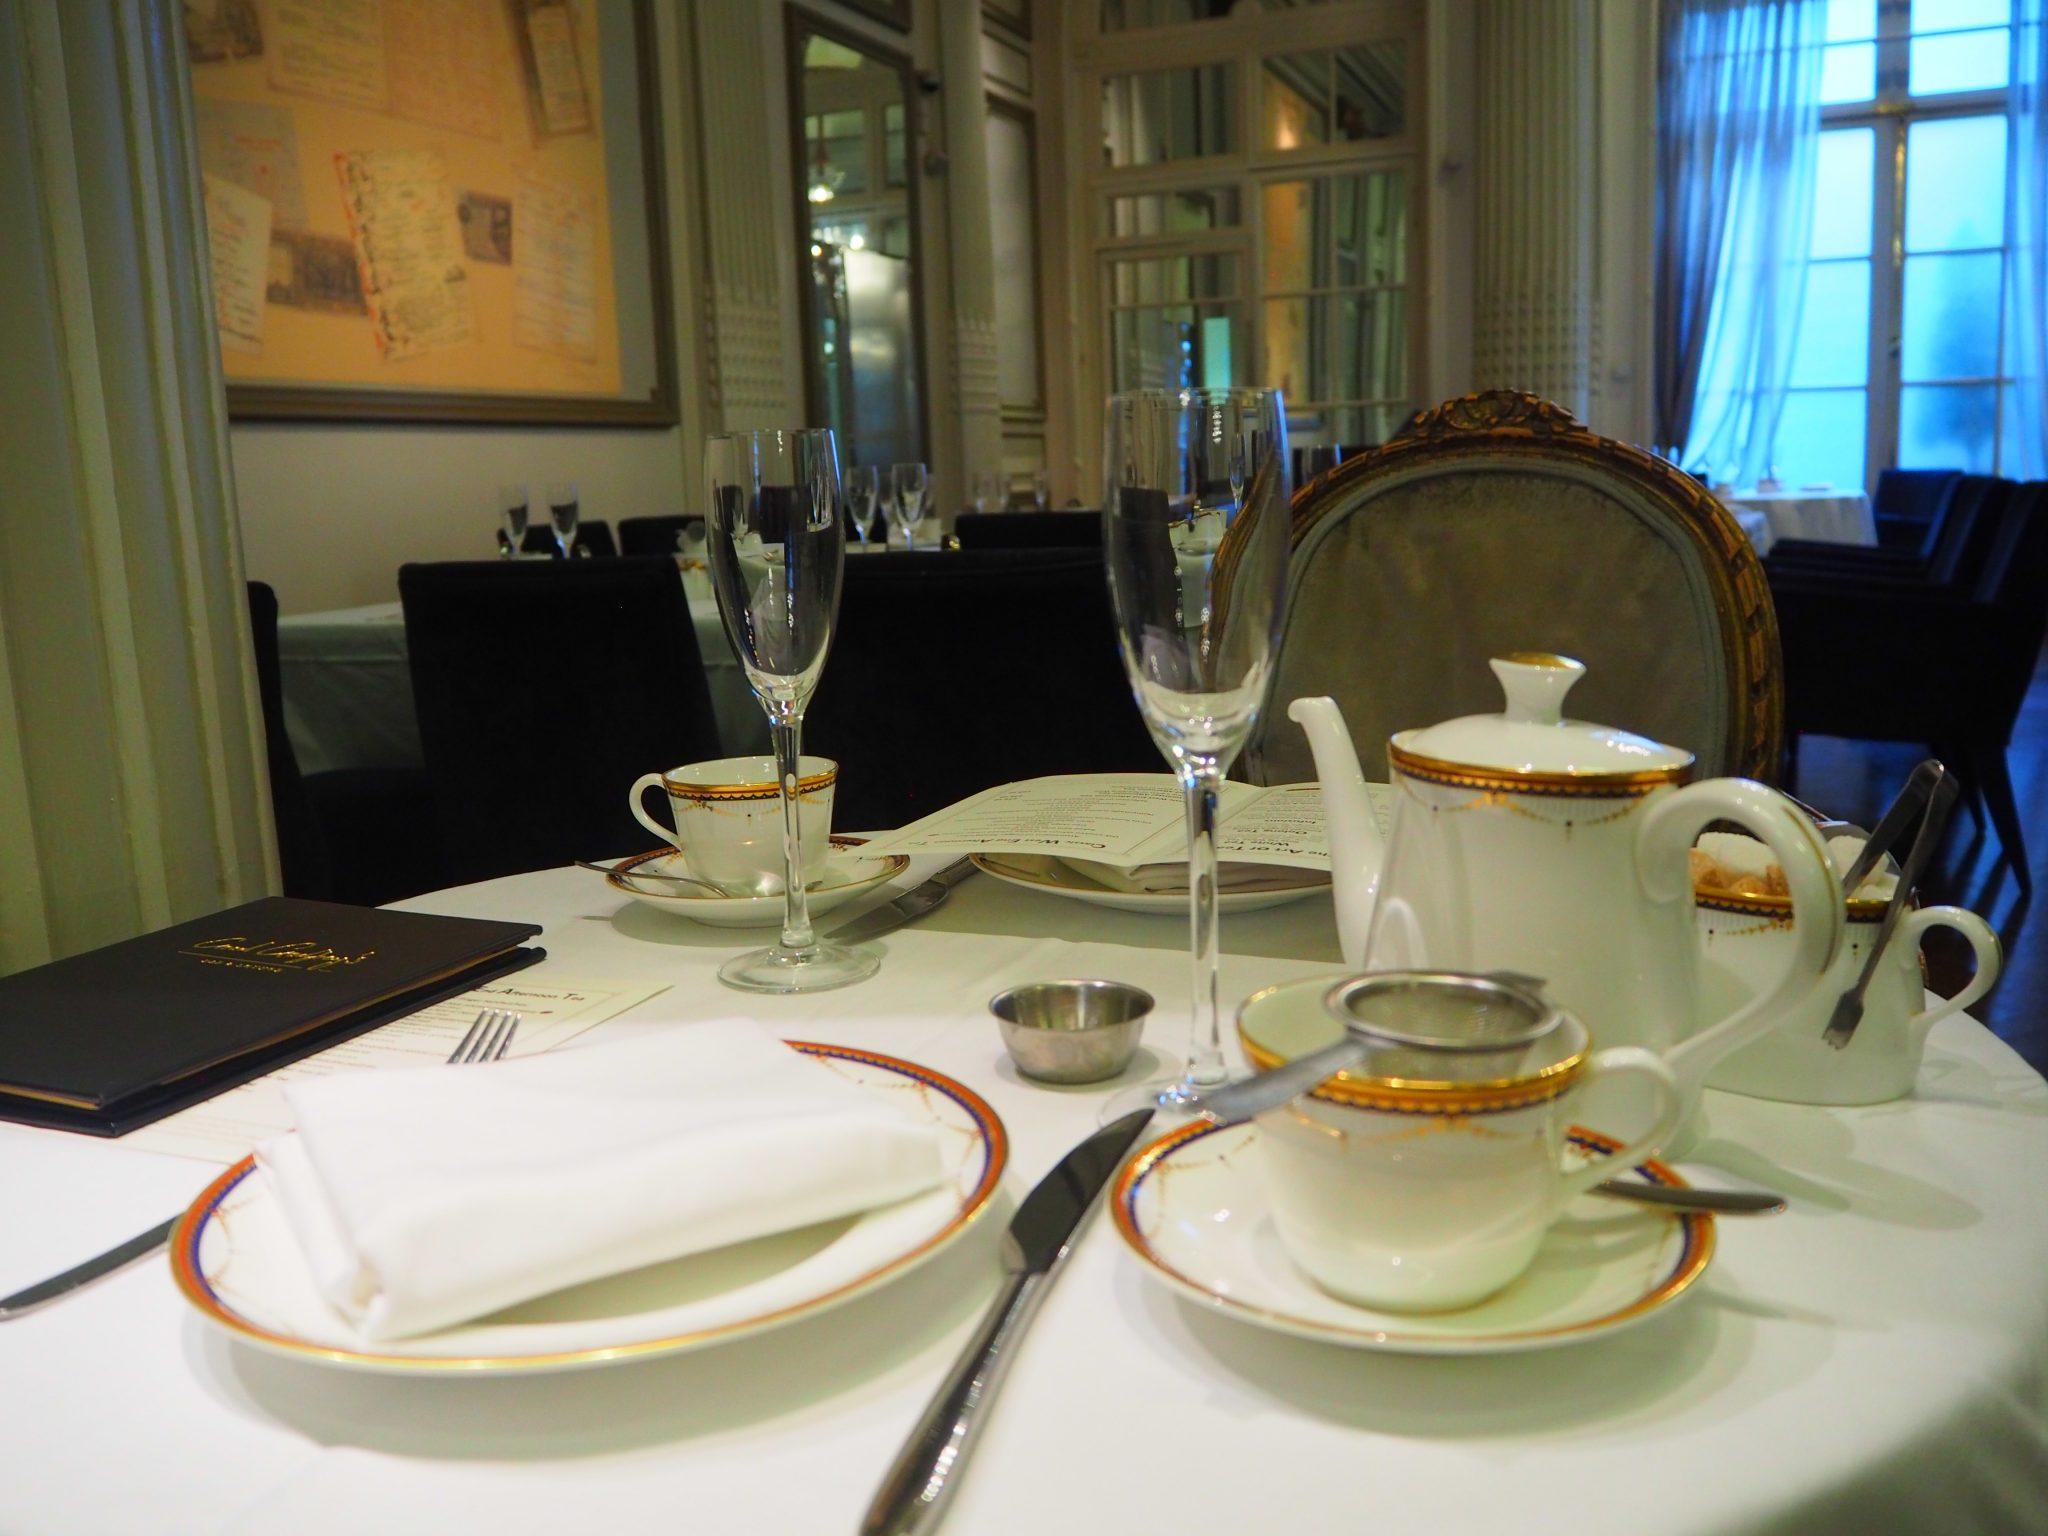 Tea & Beverages - The Waldorf Hilton Hotel London Afternoon Tea